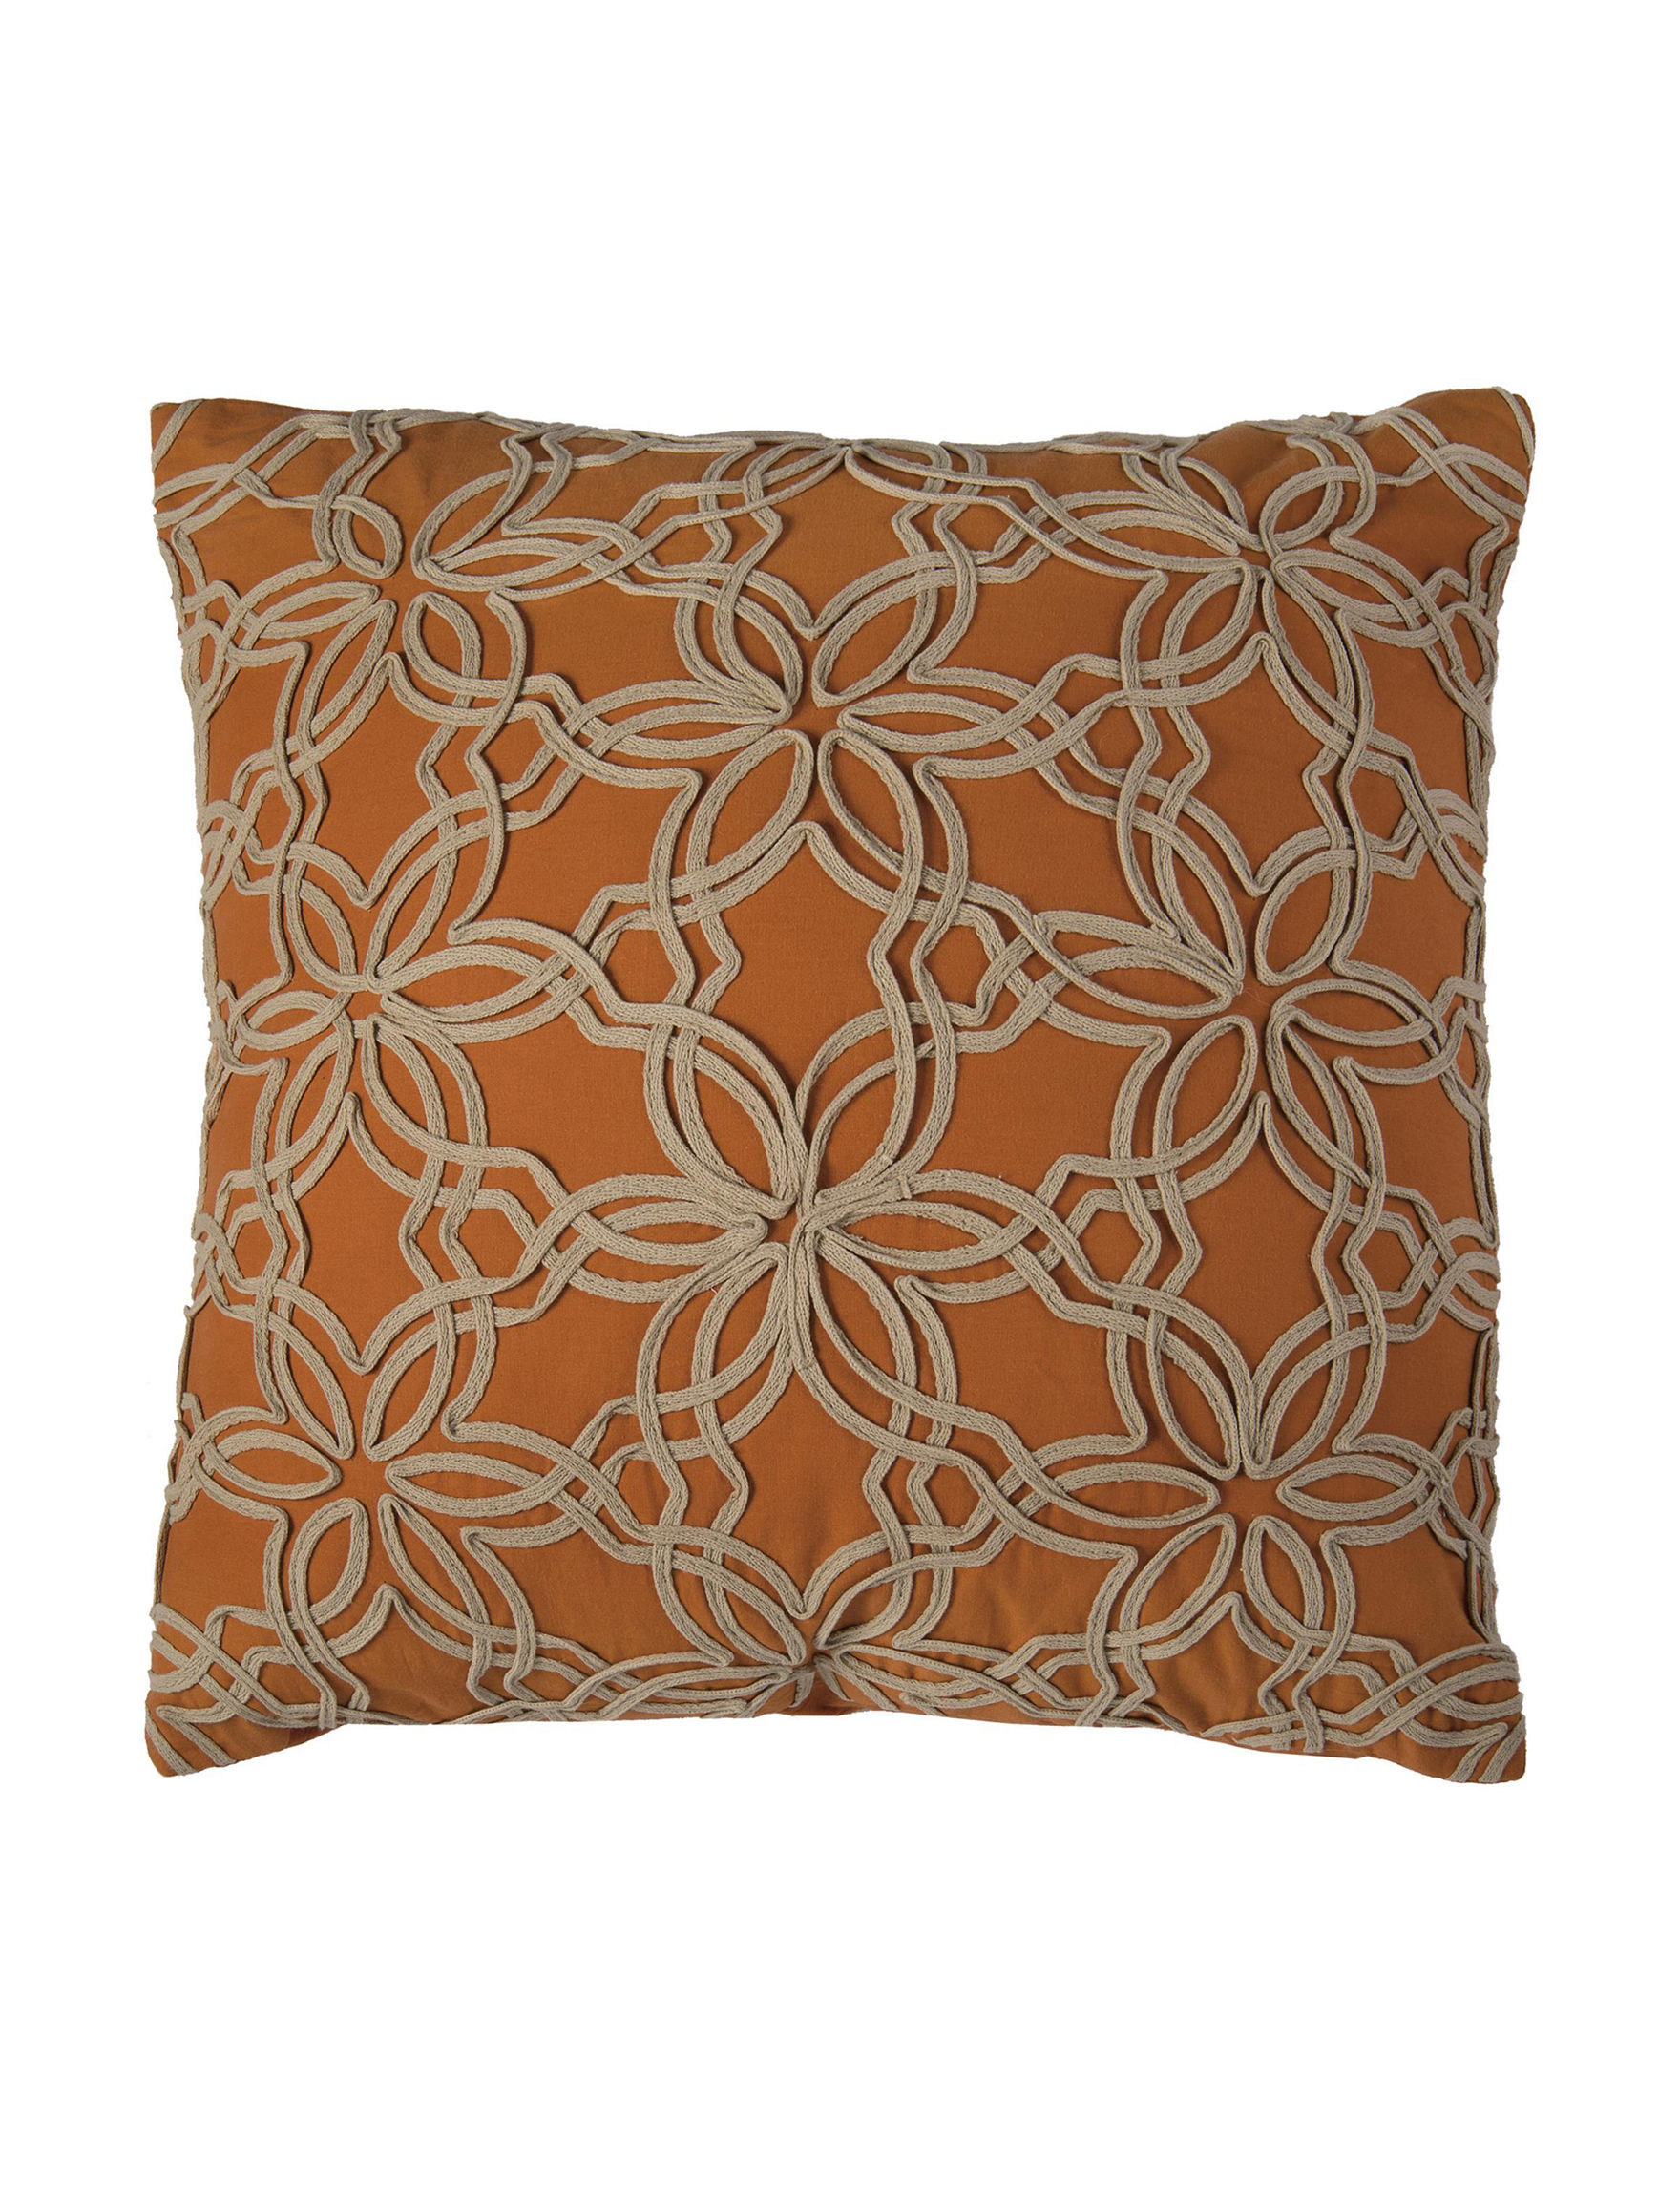 Rizzy Home Orange Decorative Pillows